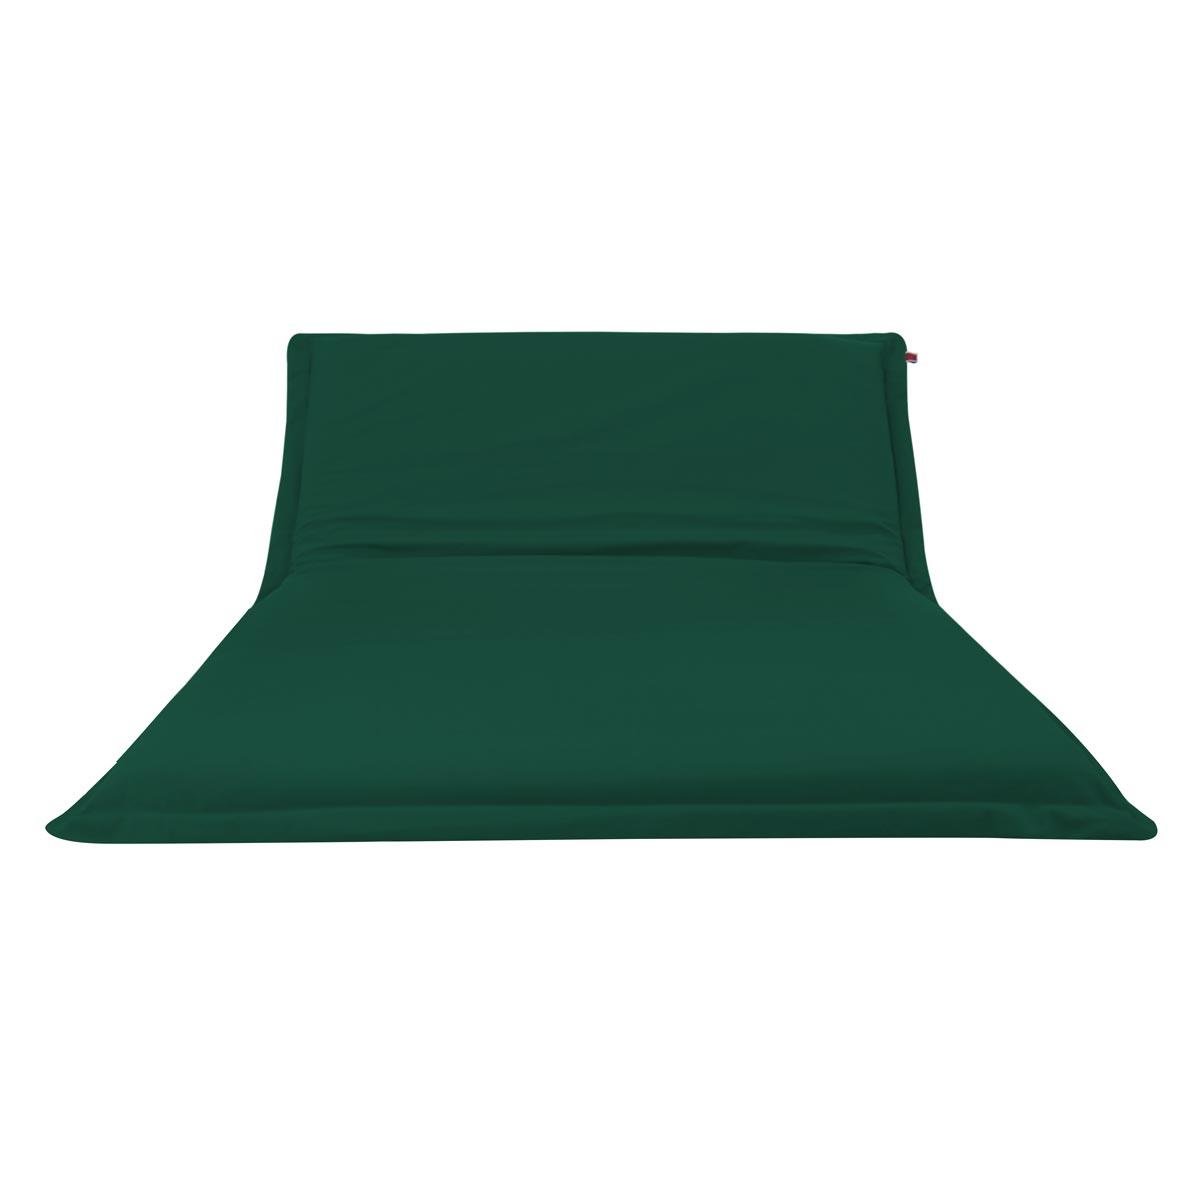 Pufe ClicClac Duo Lounge Tecido LN03 Bistro 01 02